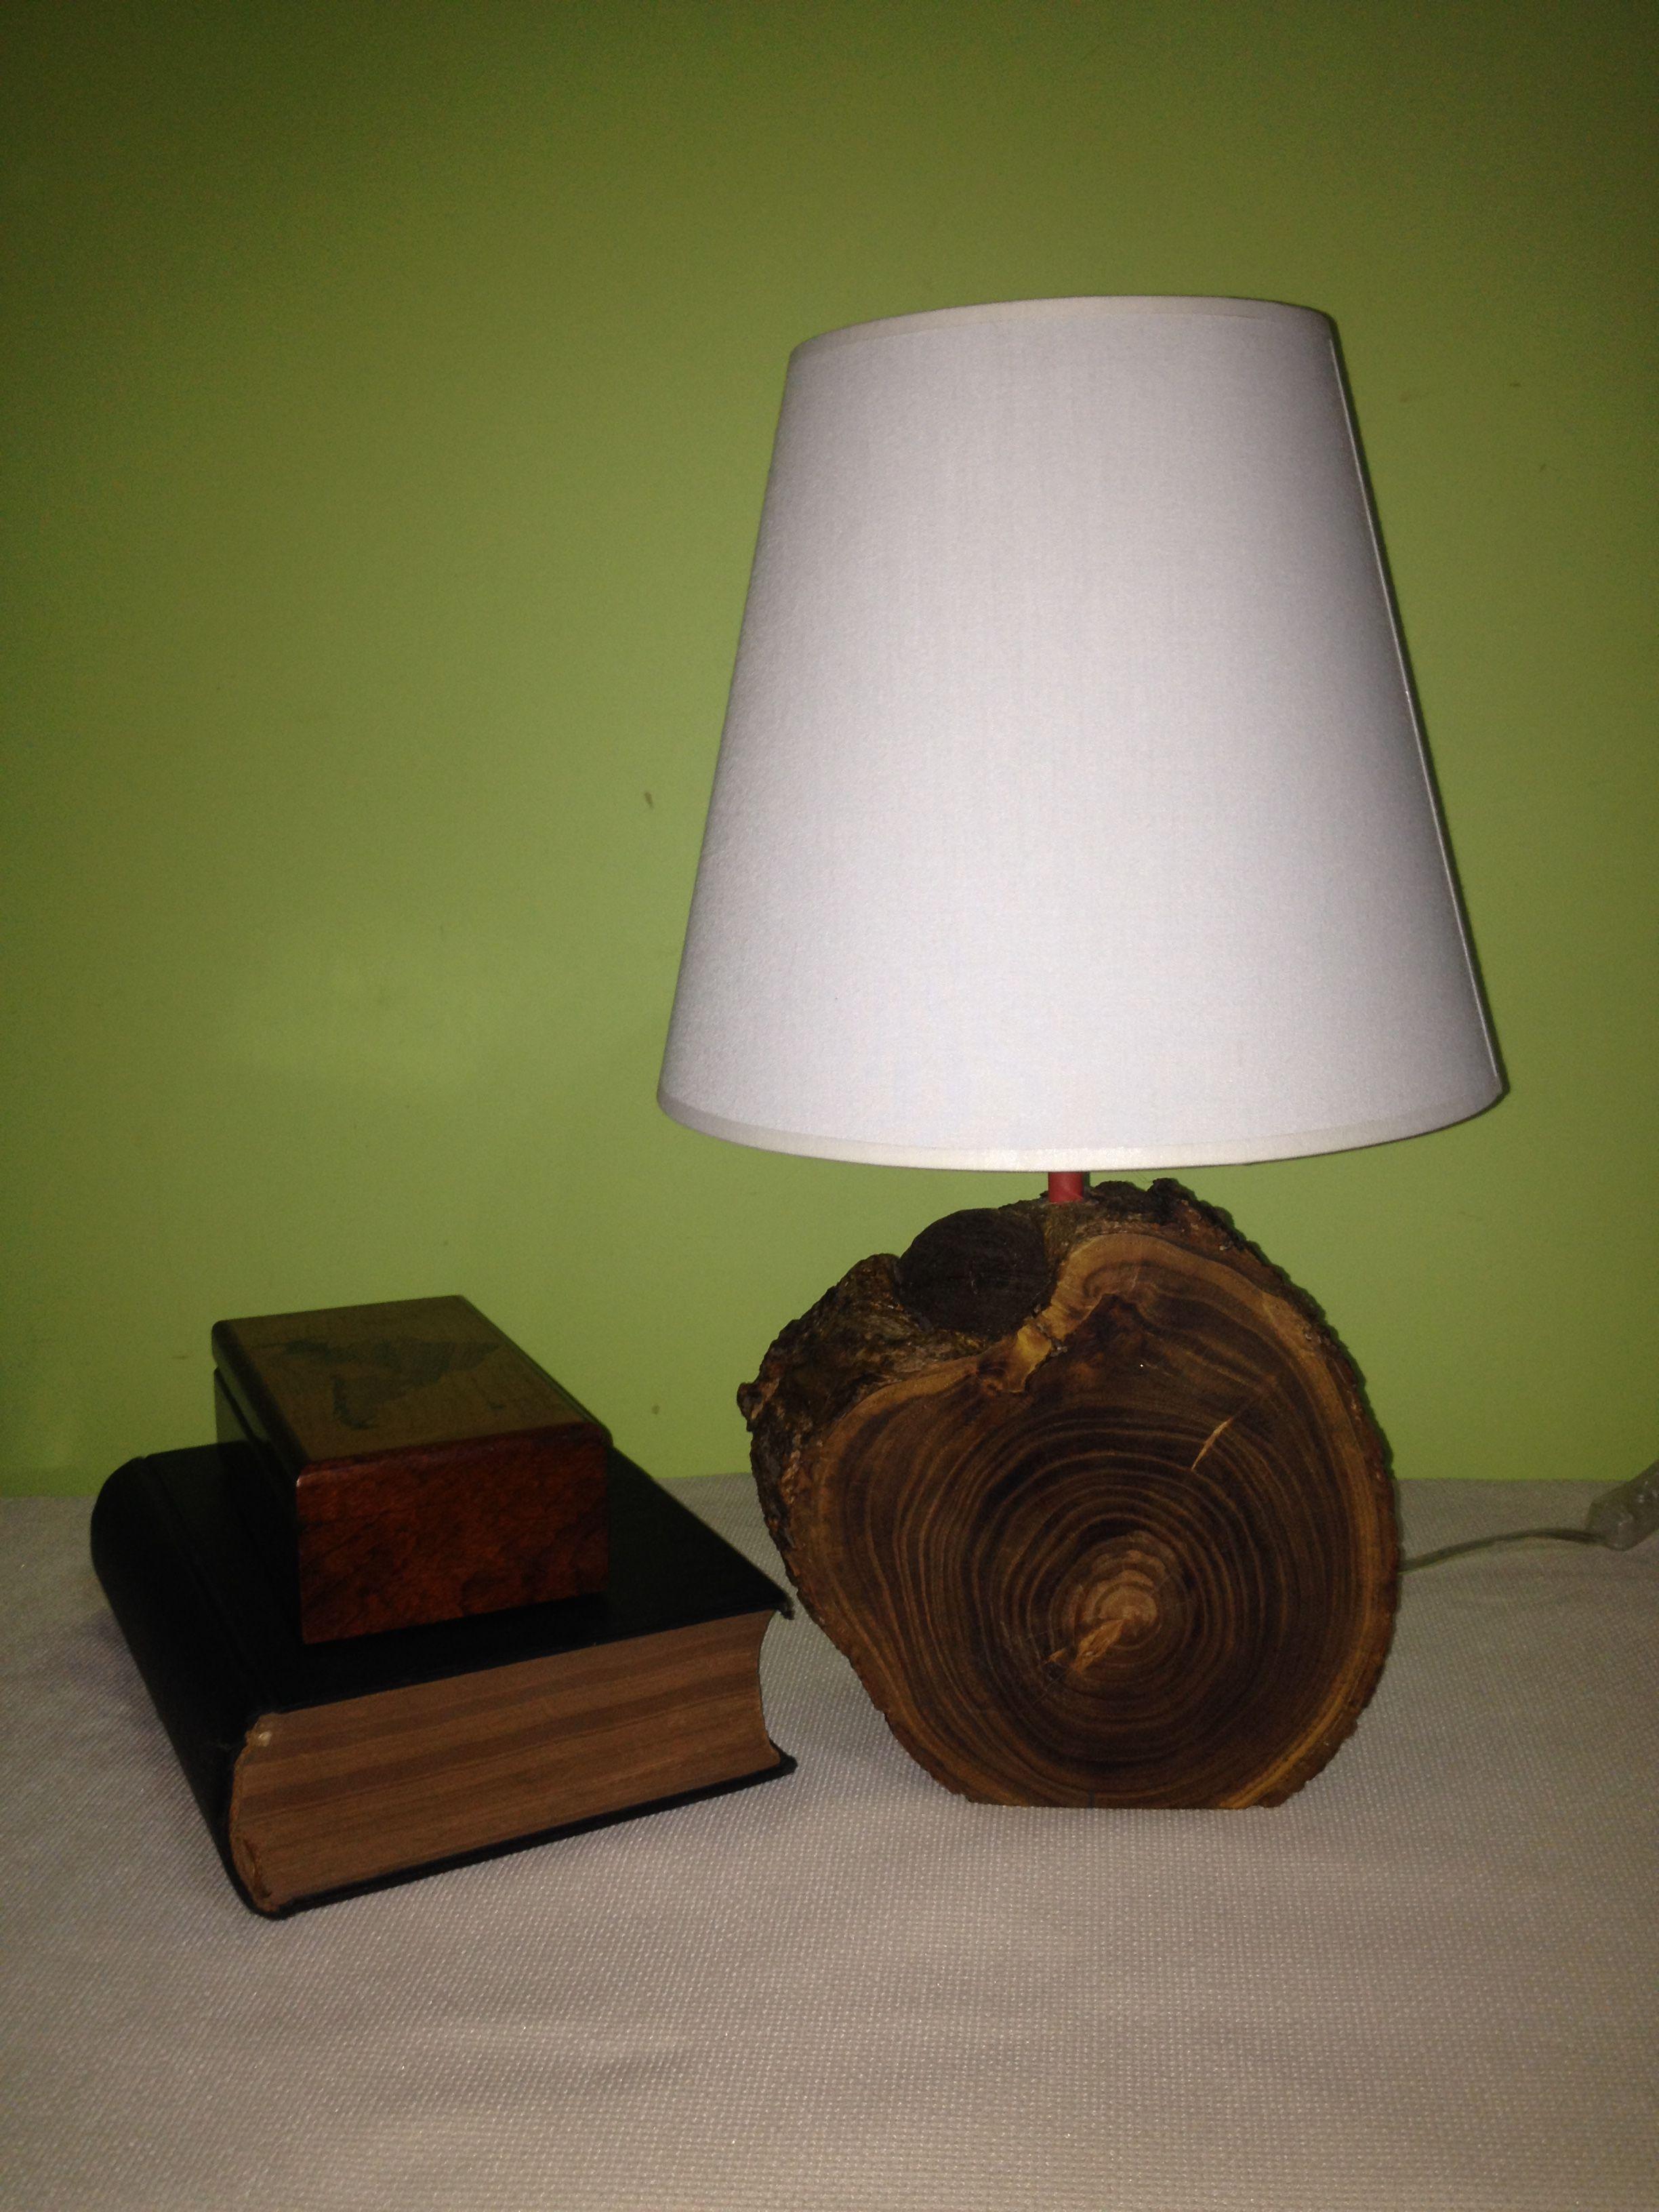 WOOD LOG BASED NIGHT LAMP #wood #woodworking #lamp #light #design ...